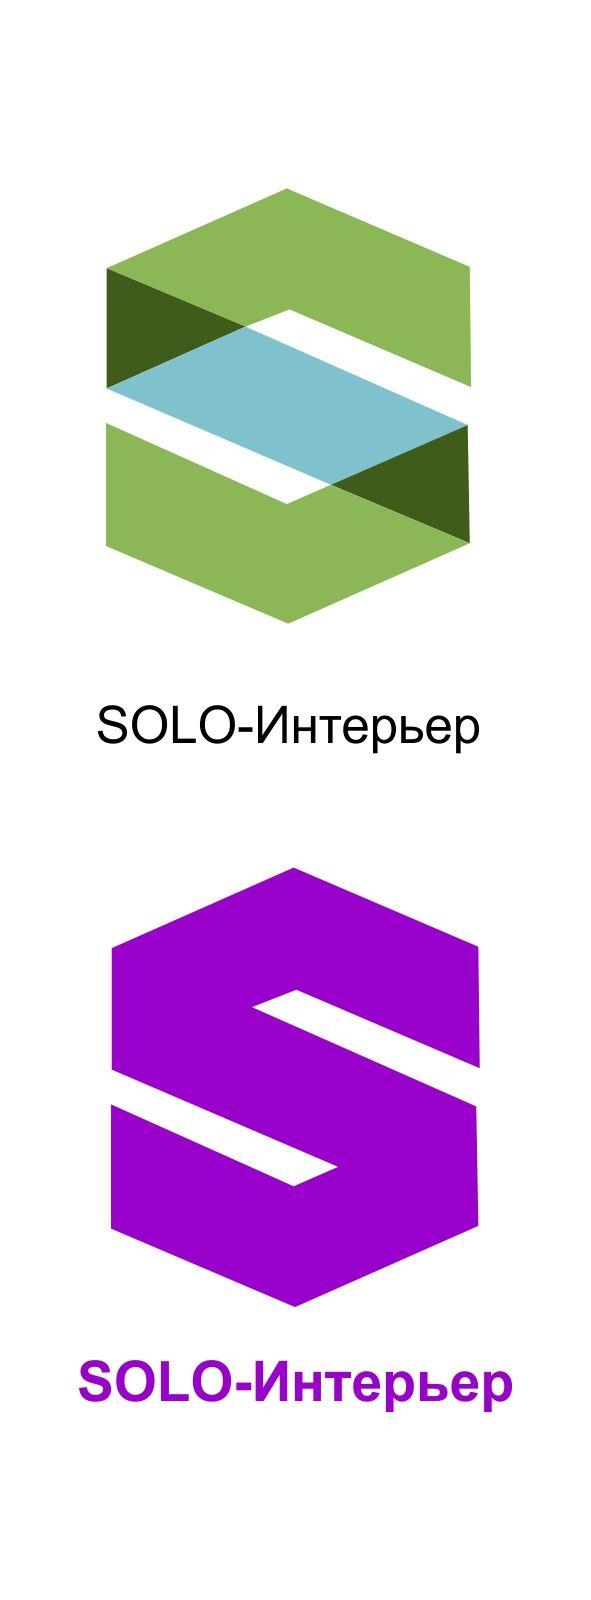 Редизайн логотипа - дизайнер Krasivayav